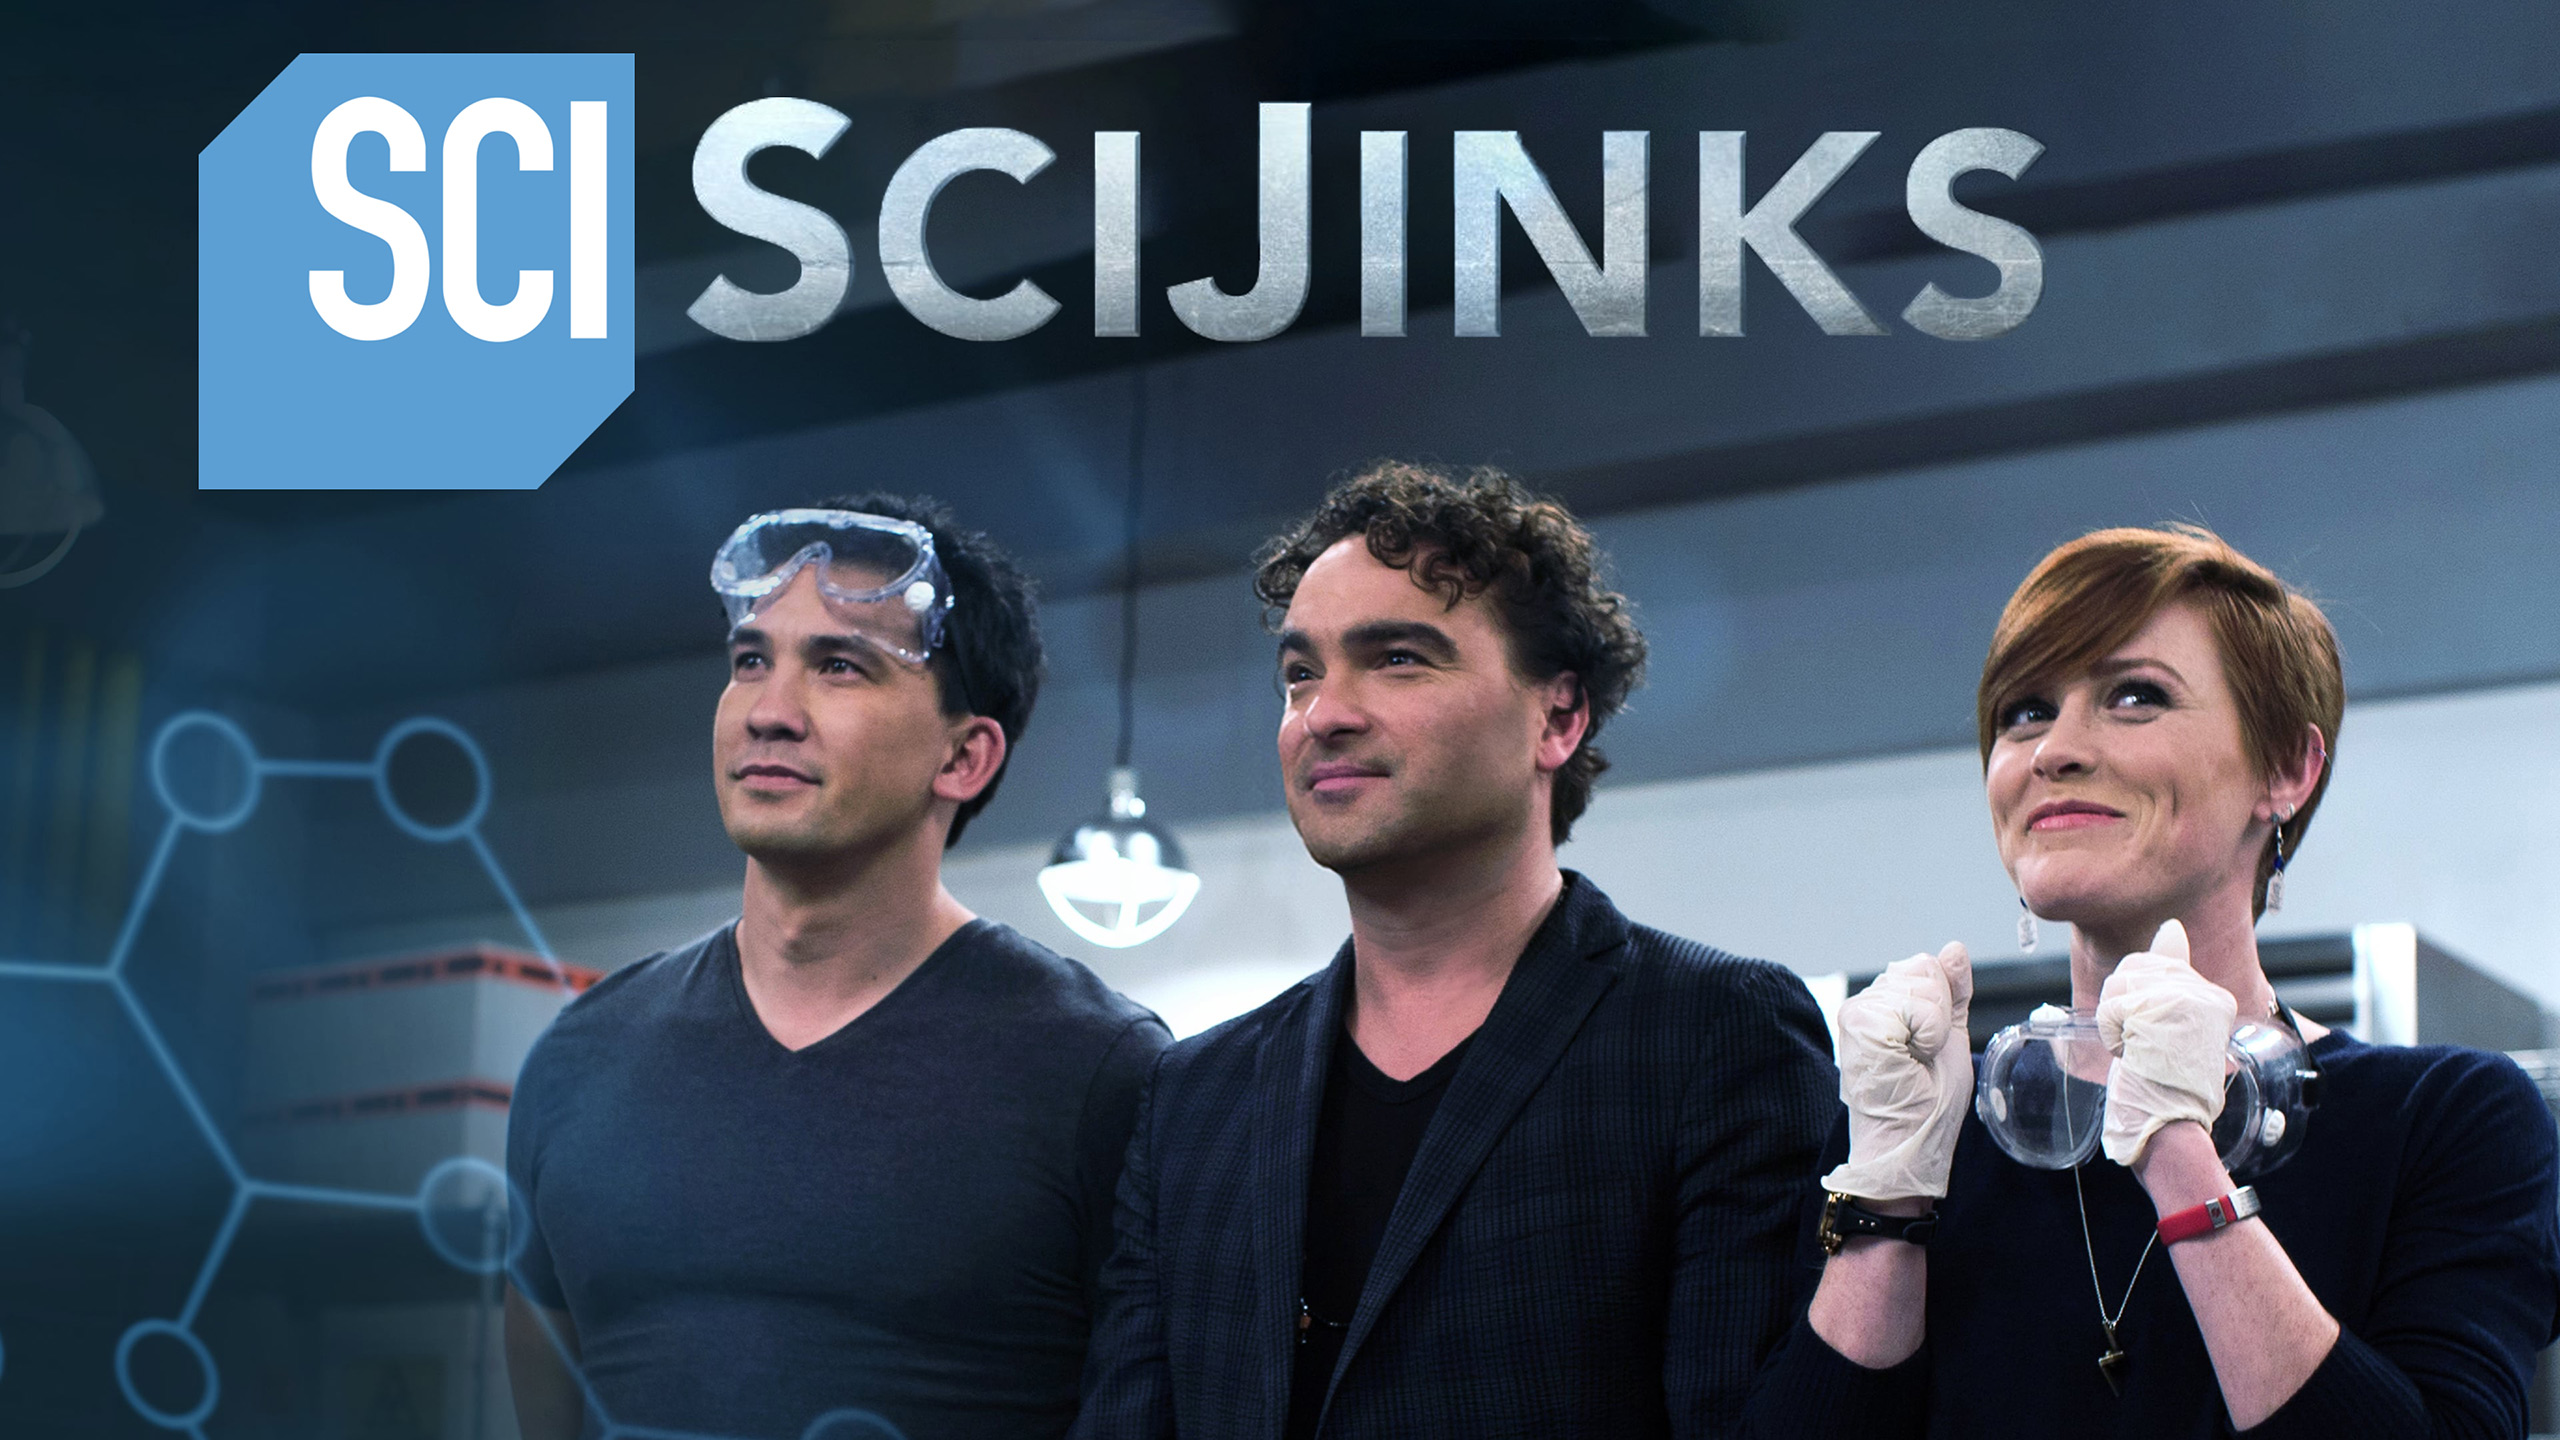 Engineering Alumna Co-hosts Science-based Prank Show